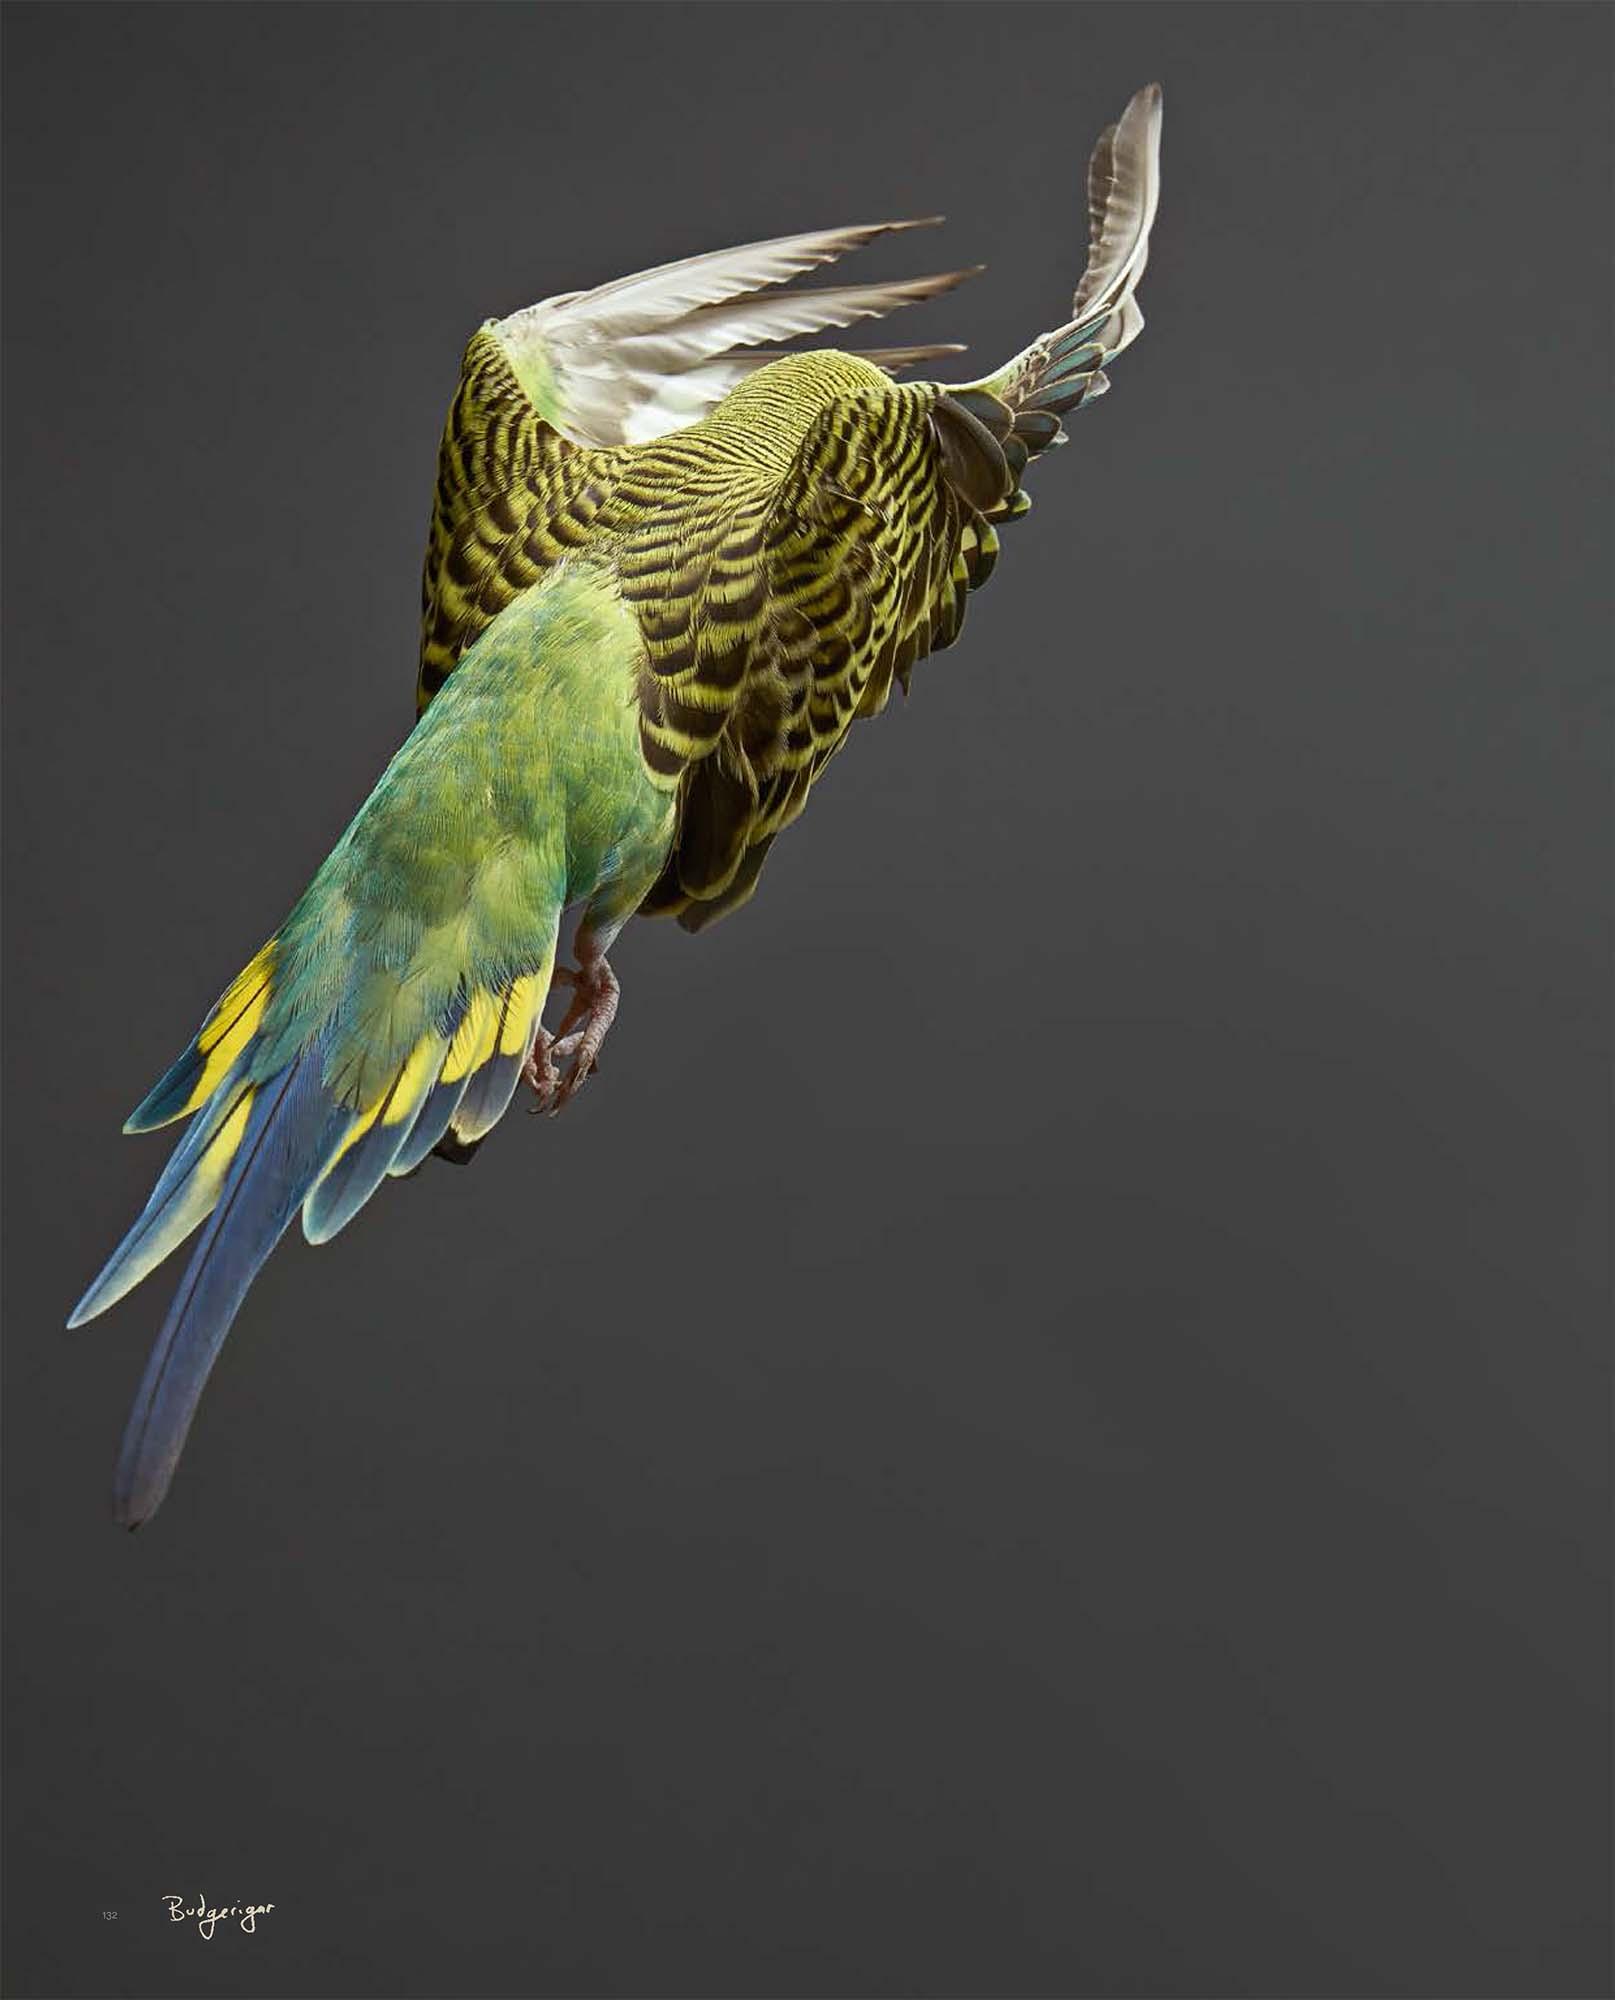 BIRD Gary Heery Book-completemmockup-134.jpg